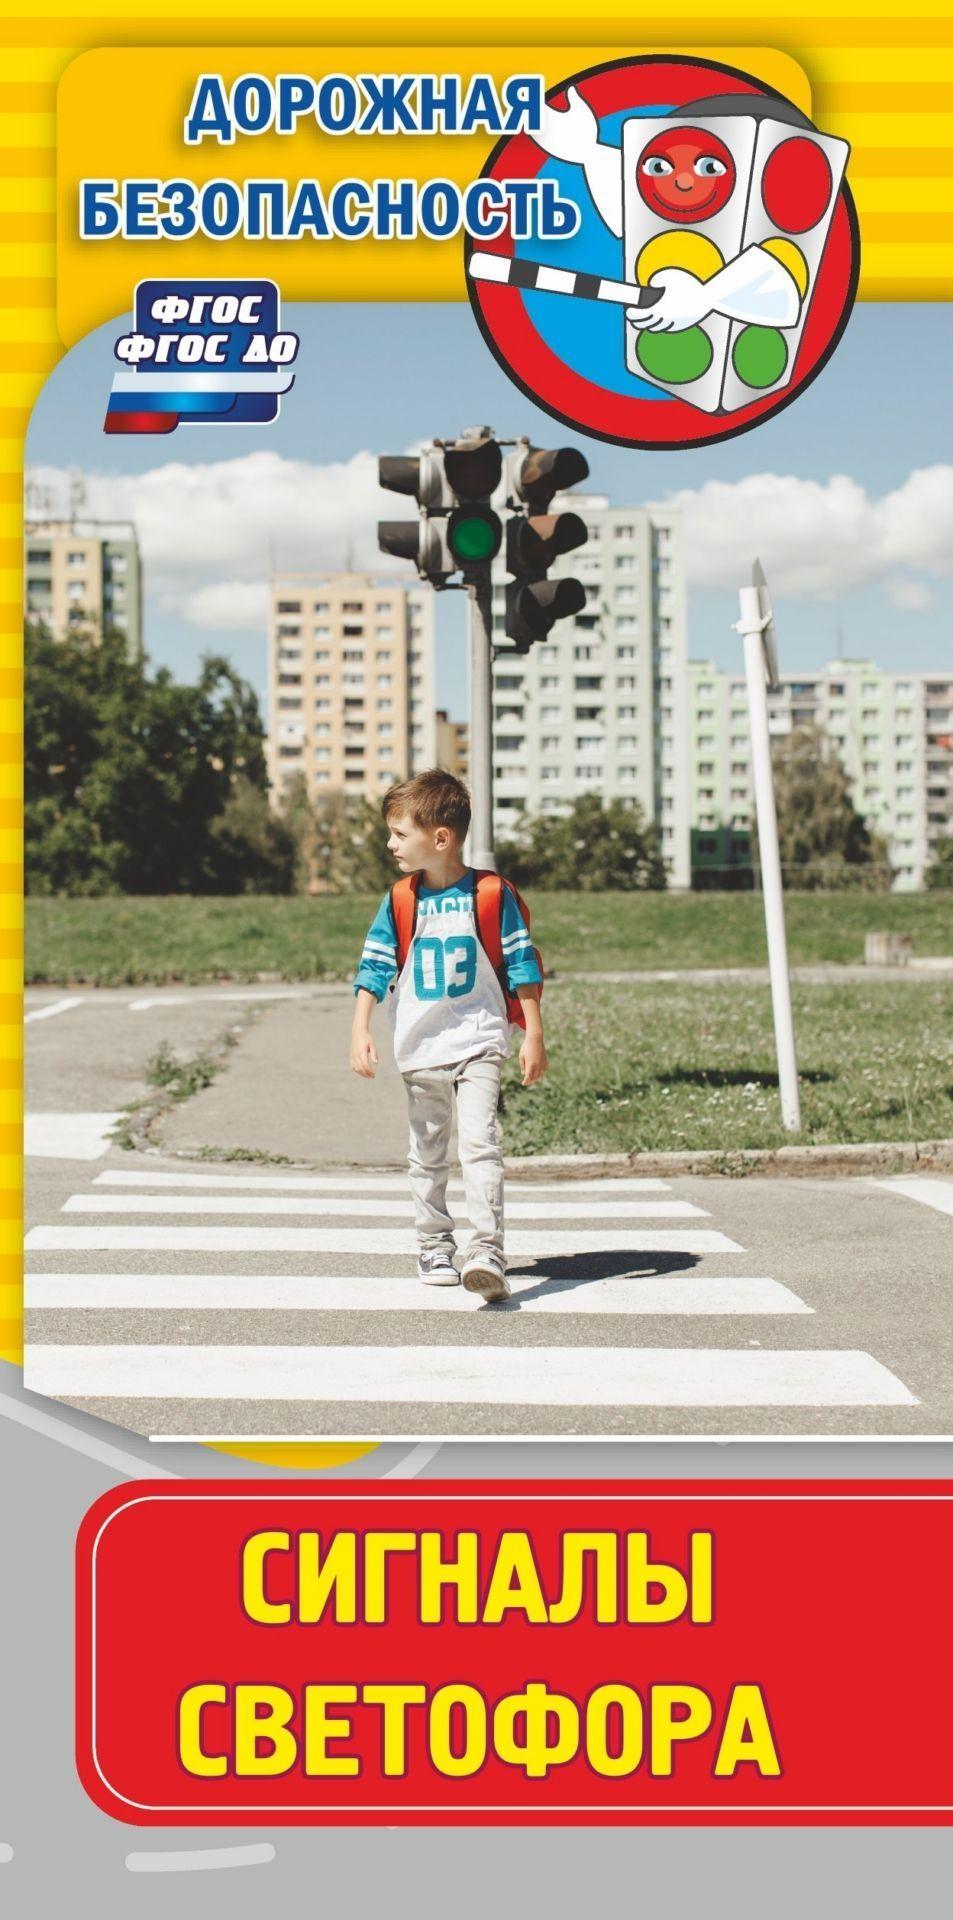 Памятка Дорожная безопасность. Сигналы светофора: Бумага офсетная 80 г.Начальная школа<br>.<br><br>Год: 2017